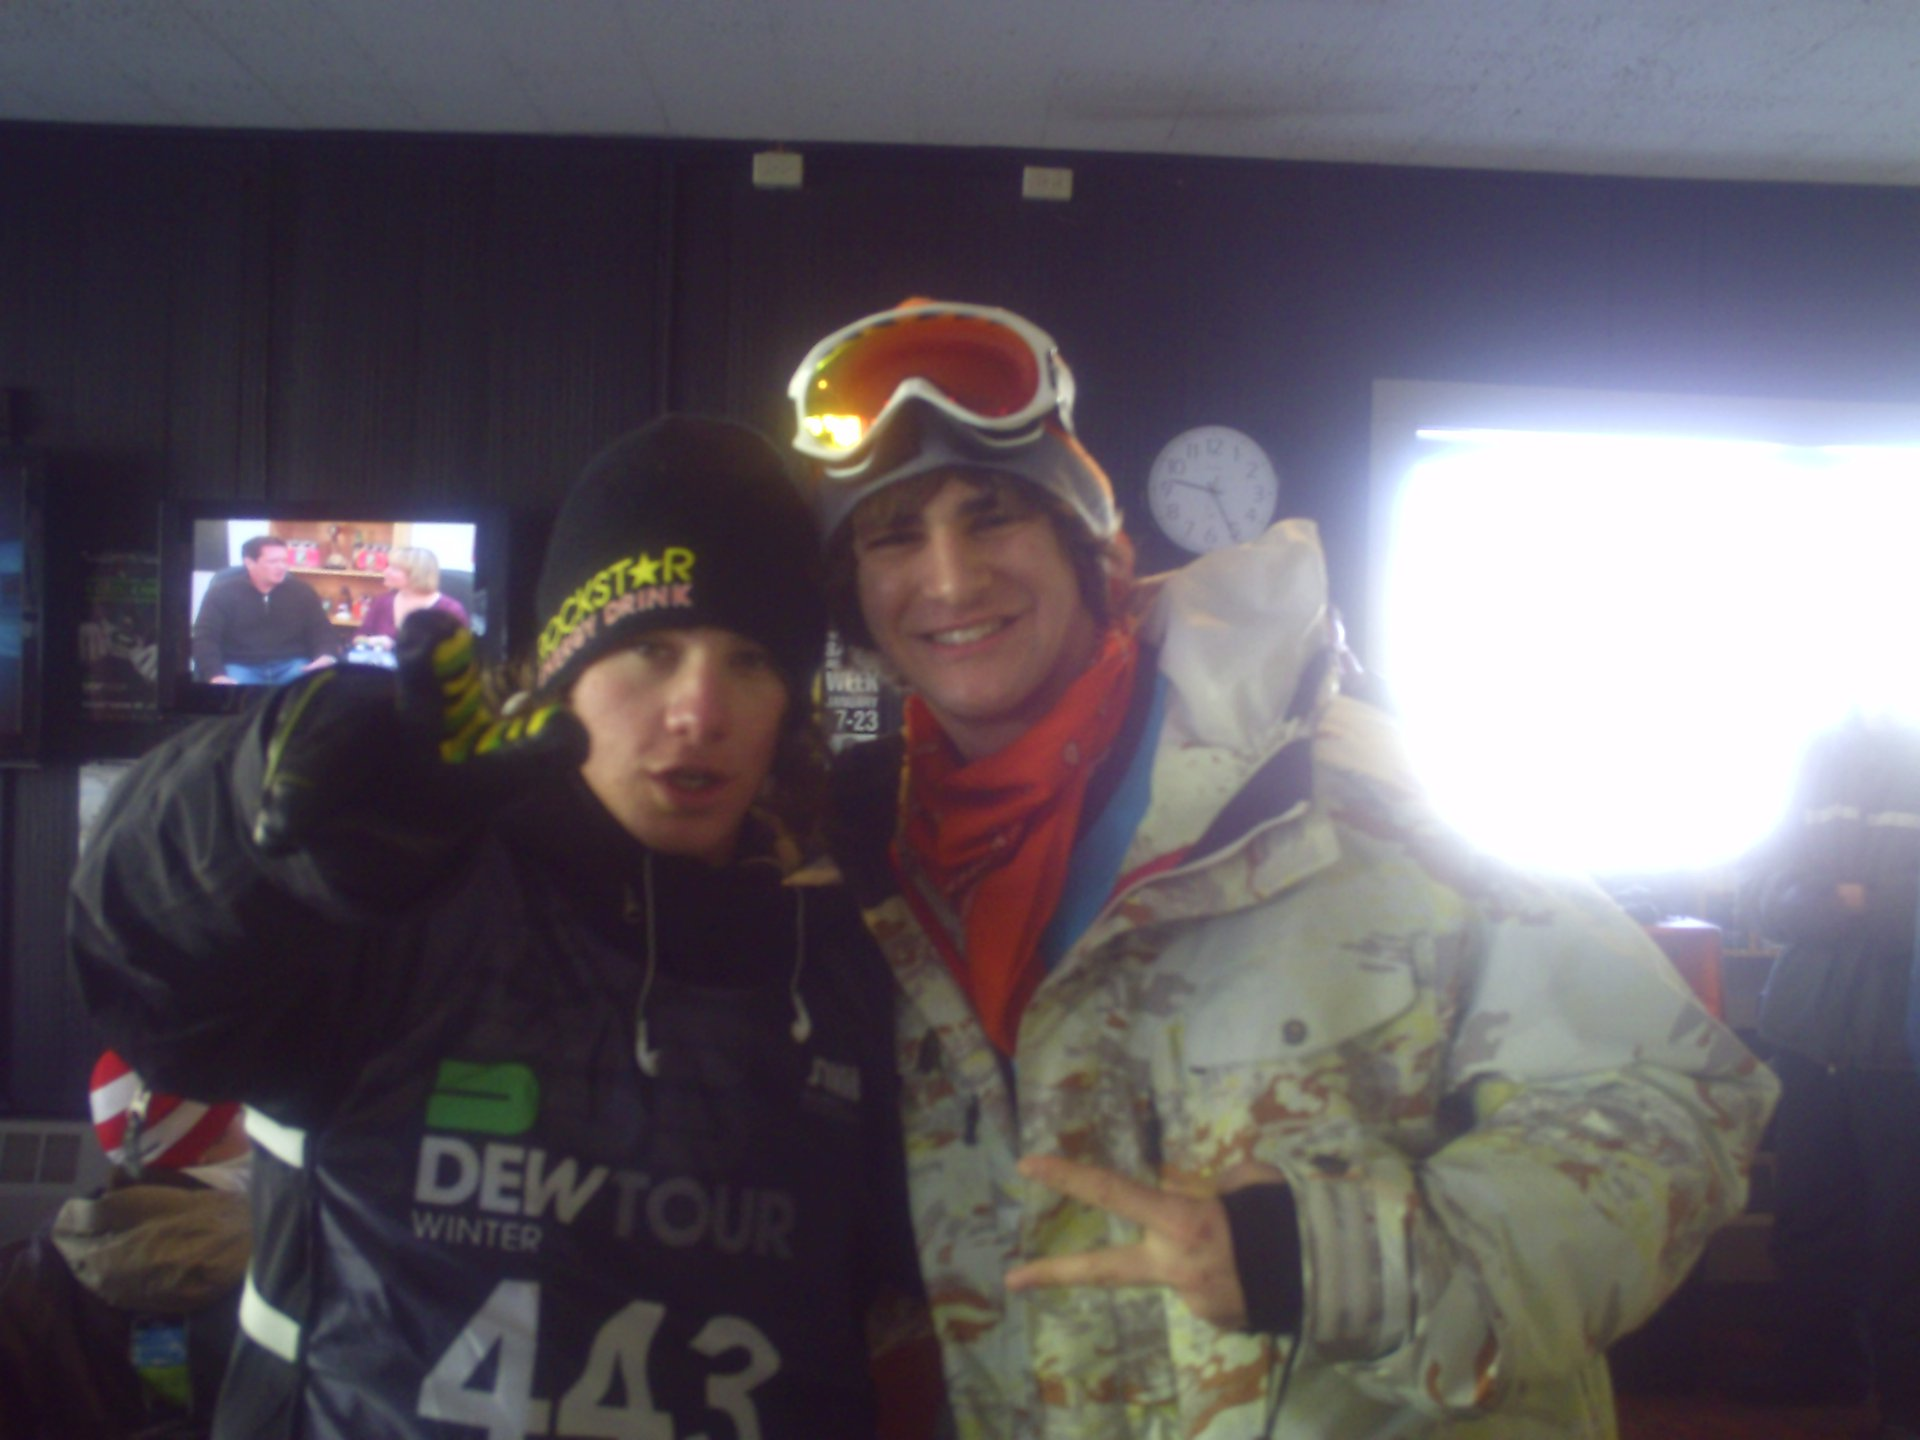 Me and Sammy